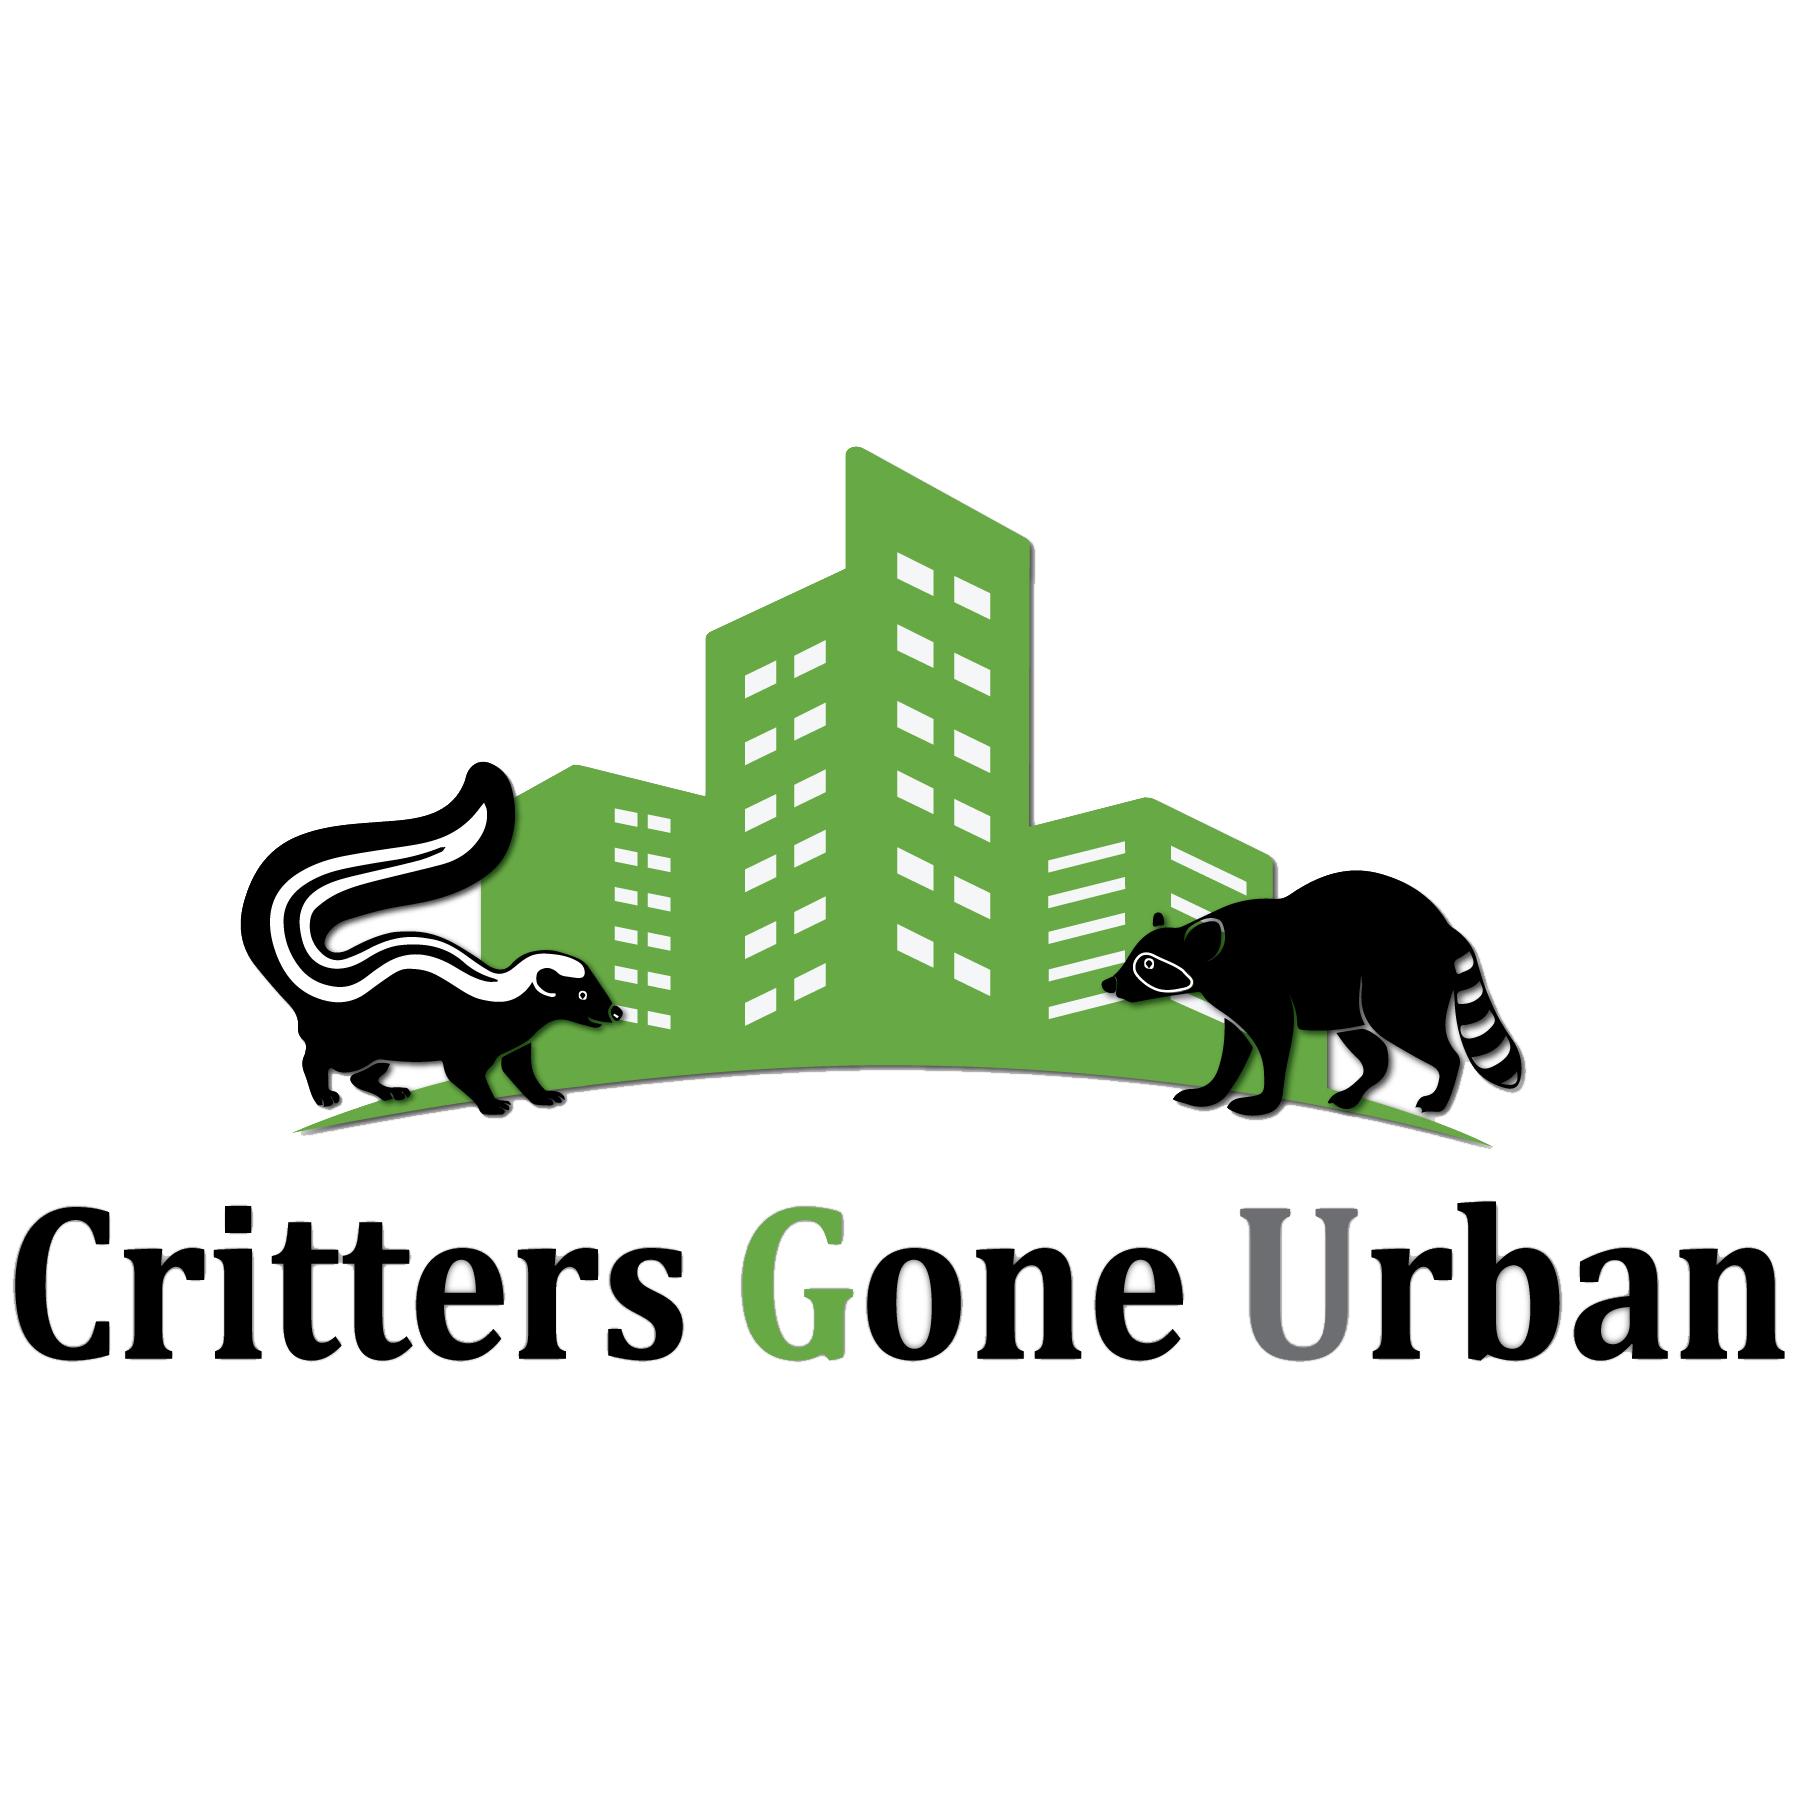 Critters Gone Urban, LLC